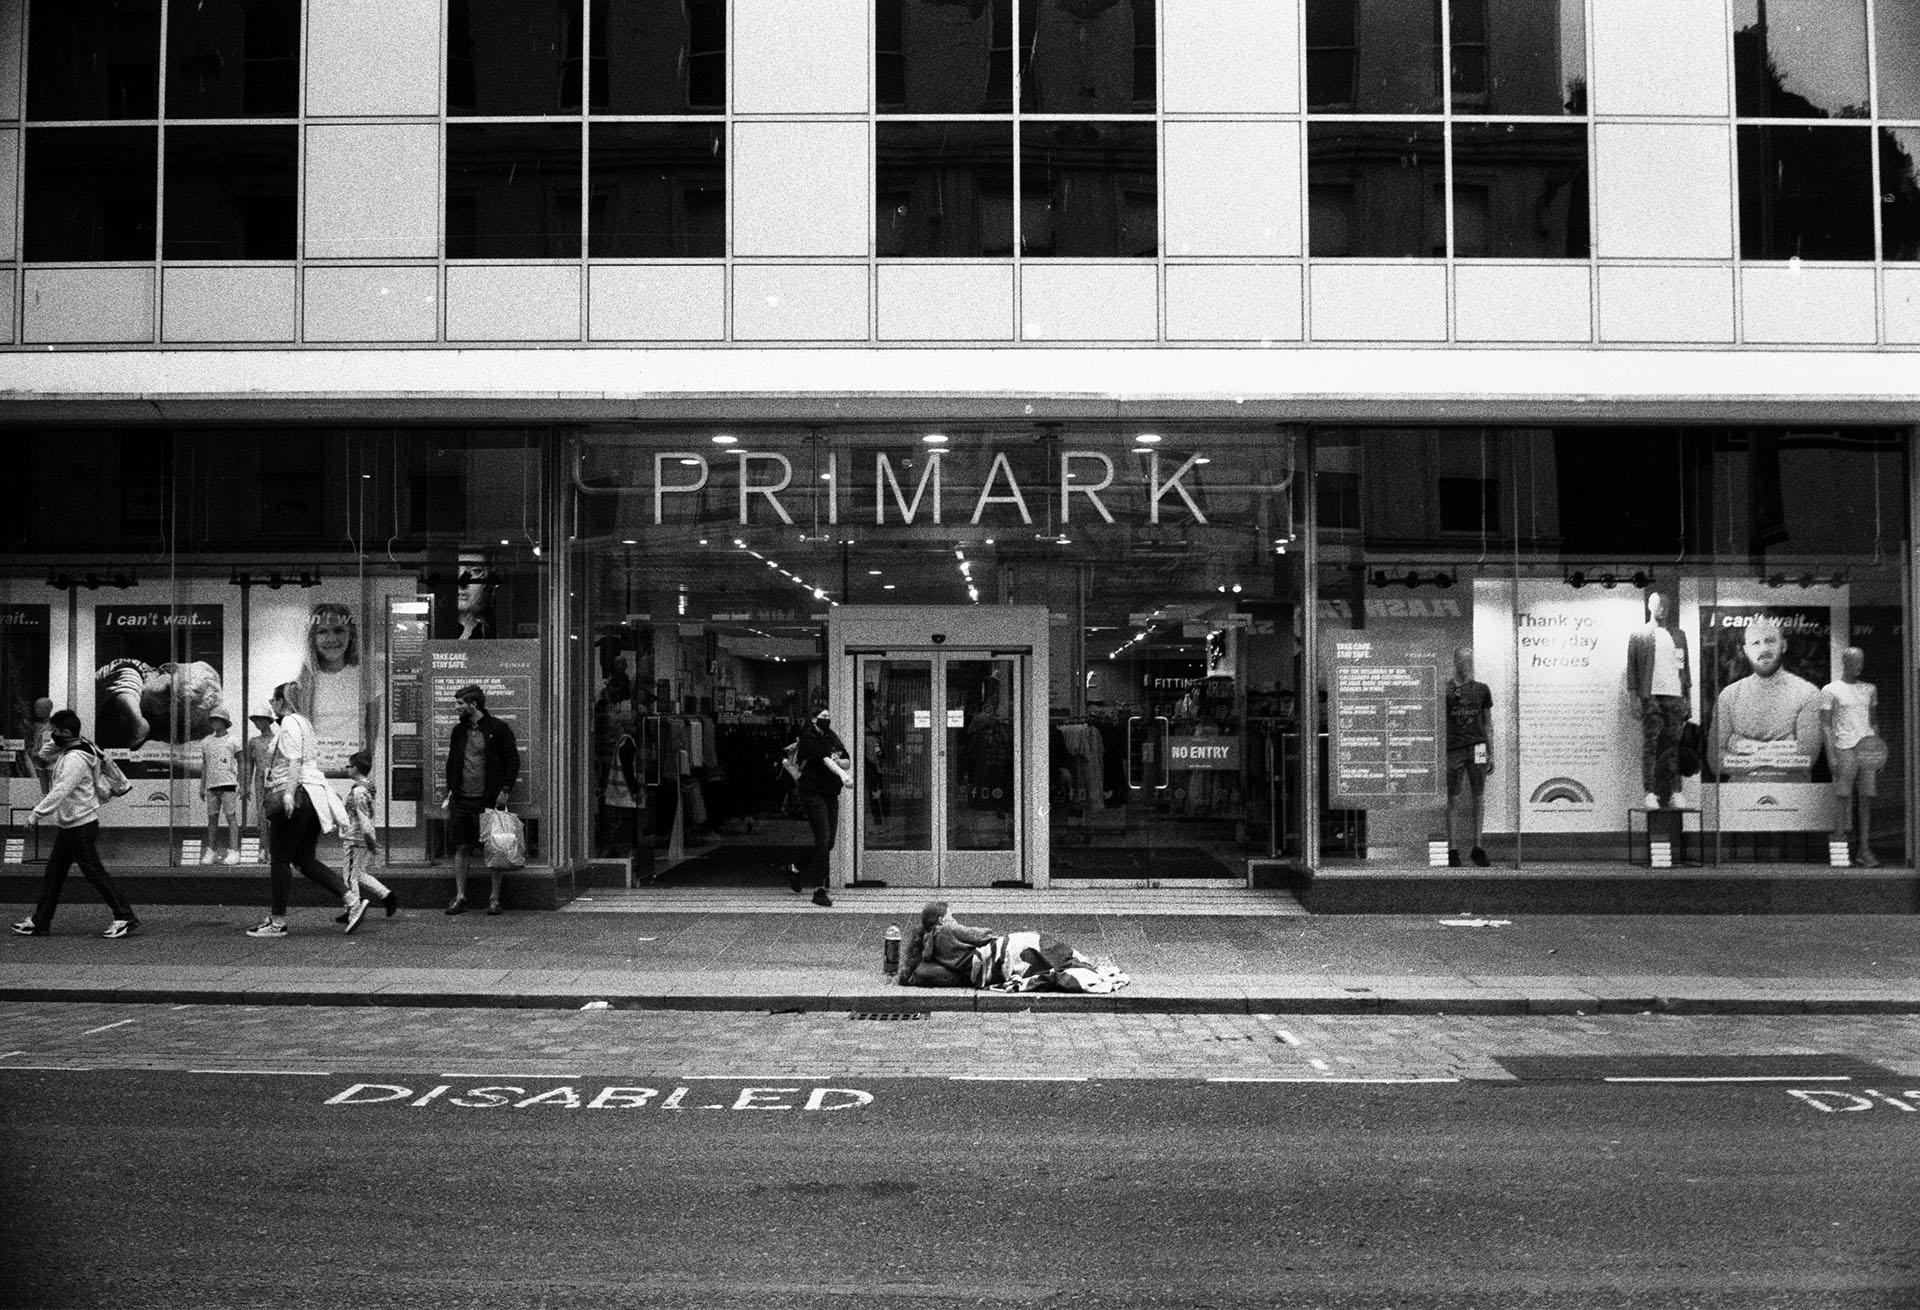 Glasgow street photography 35mm